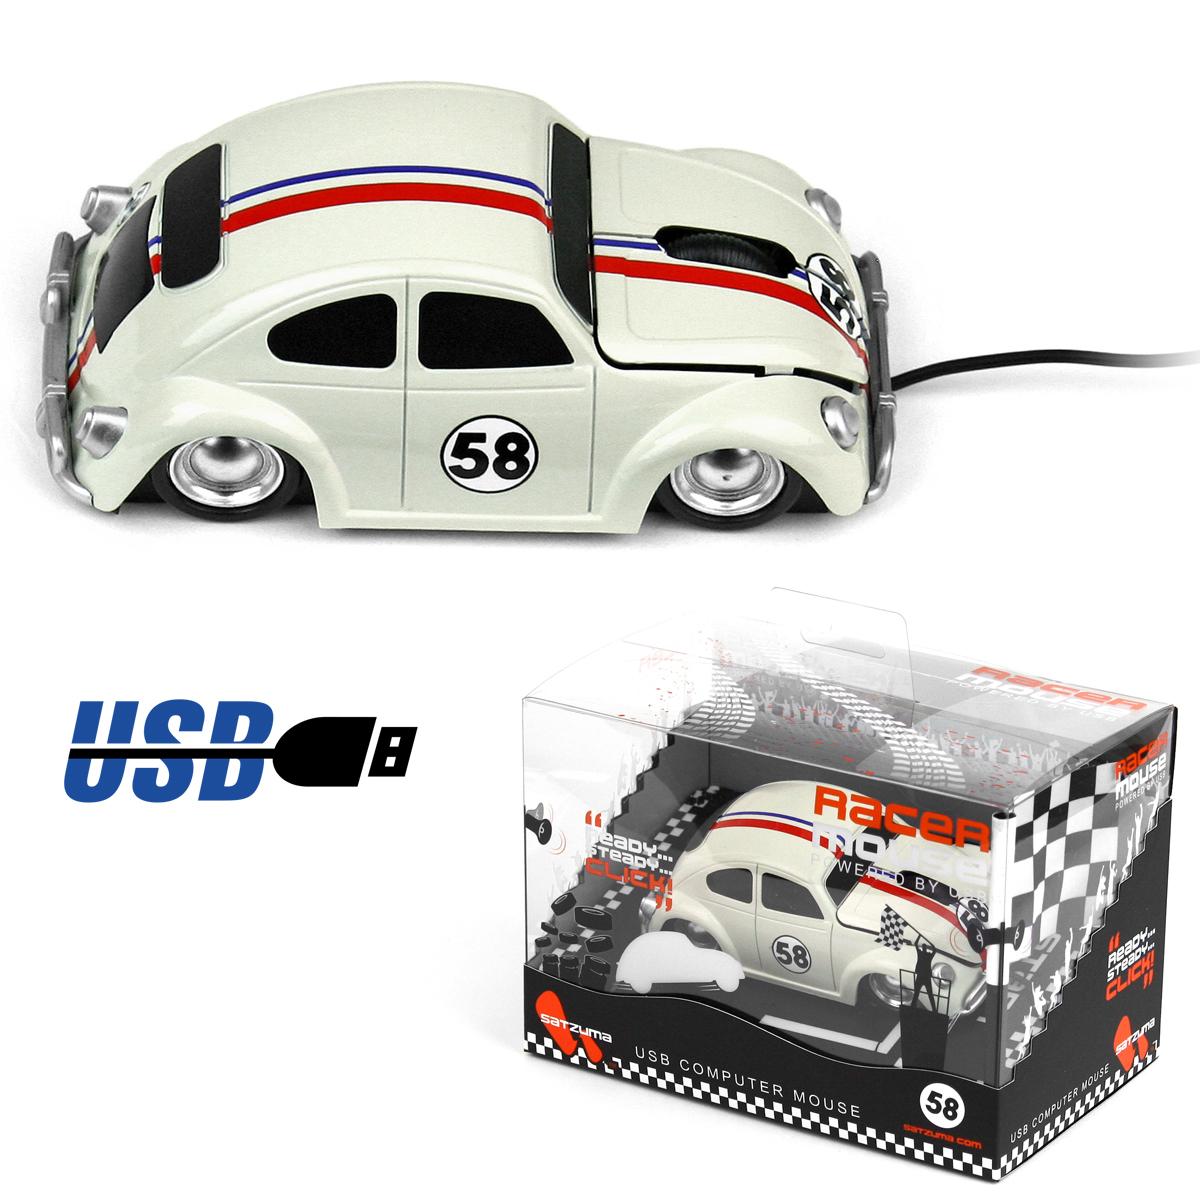 USB-Maus Racer